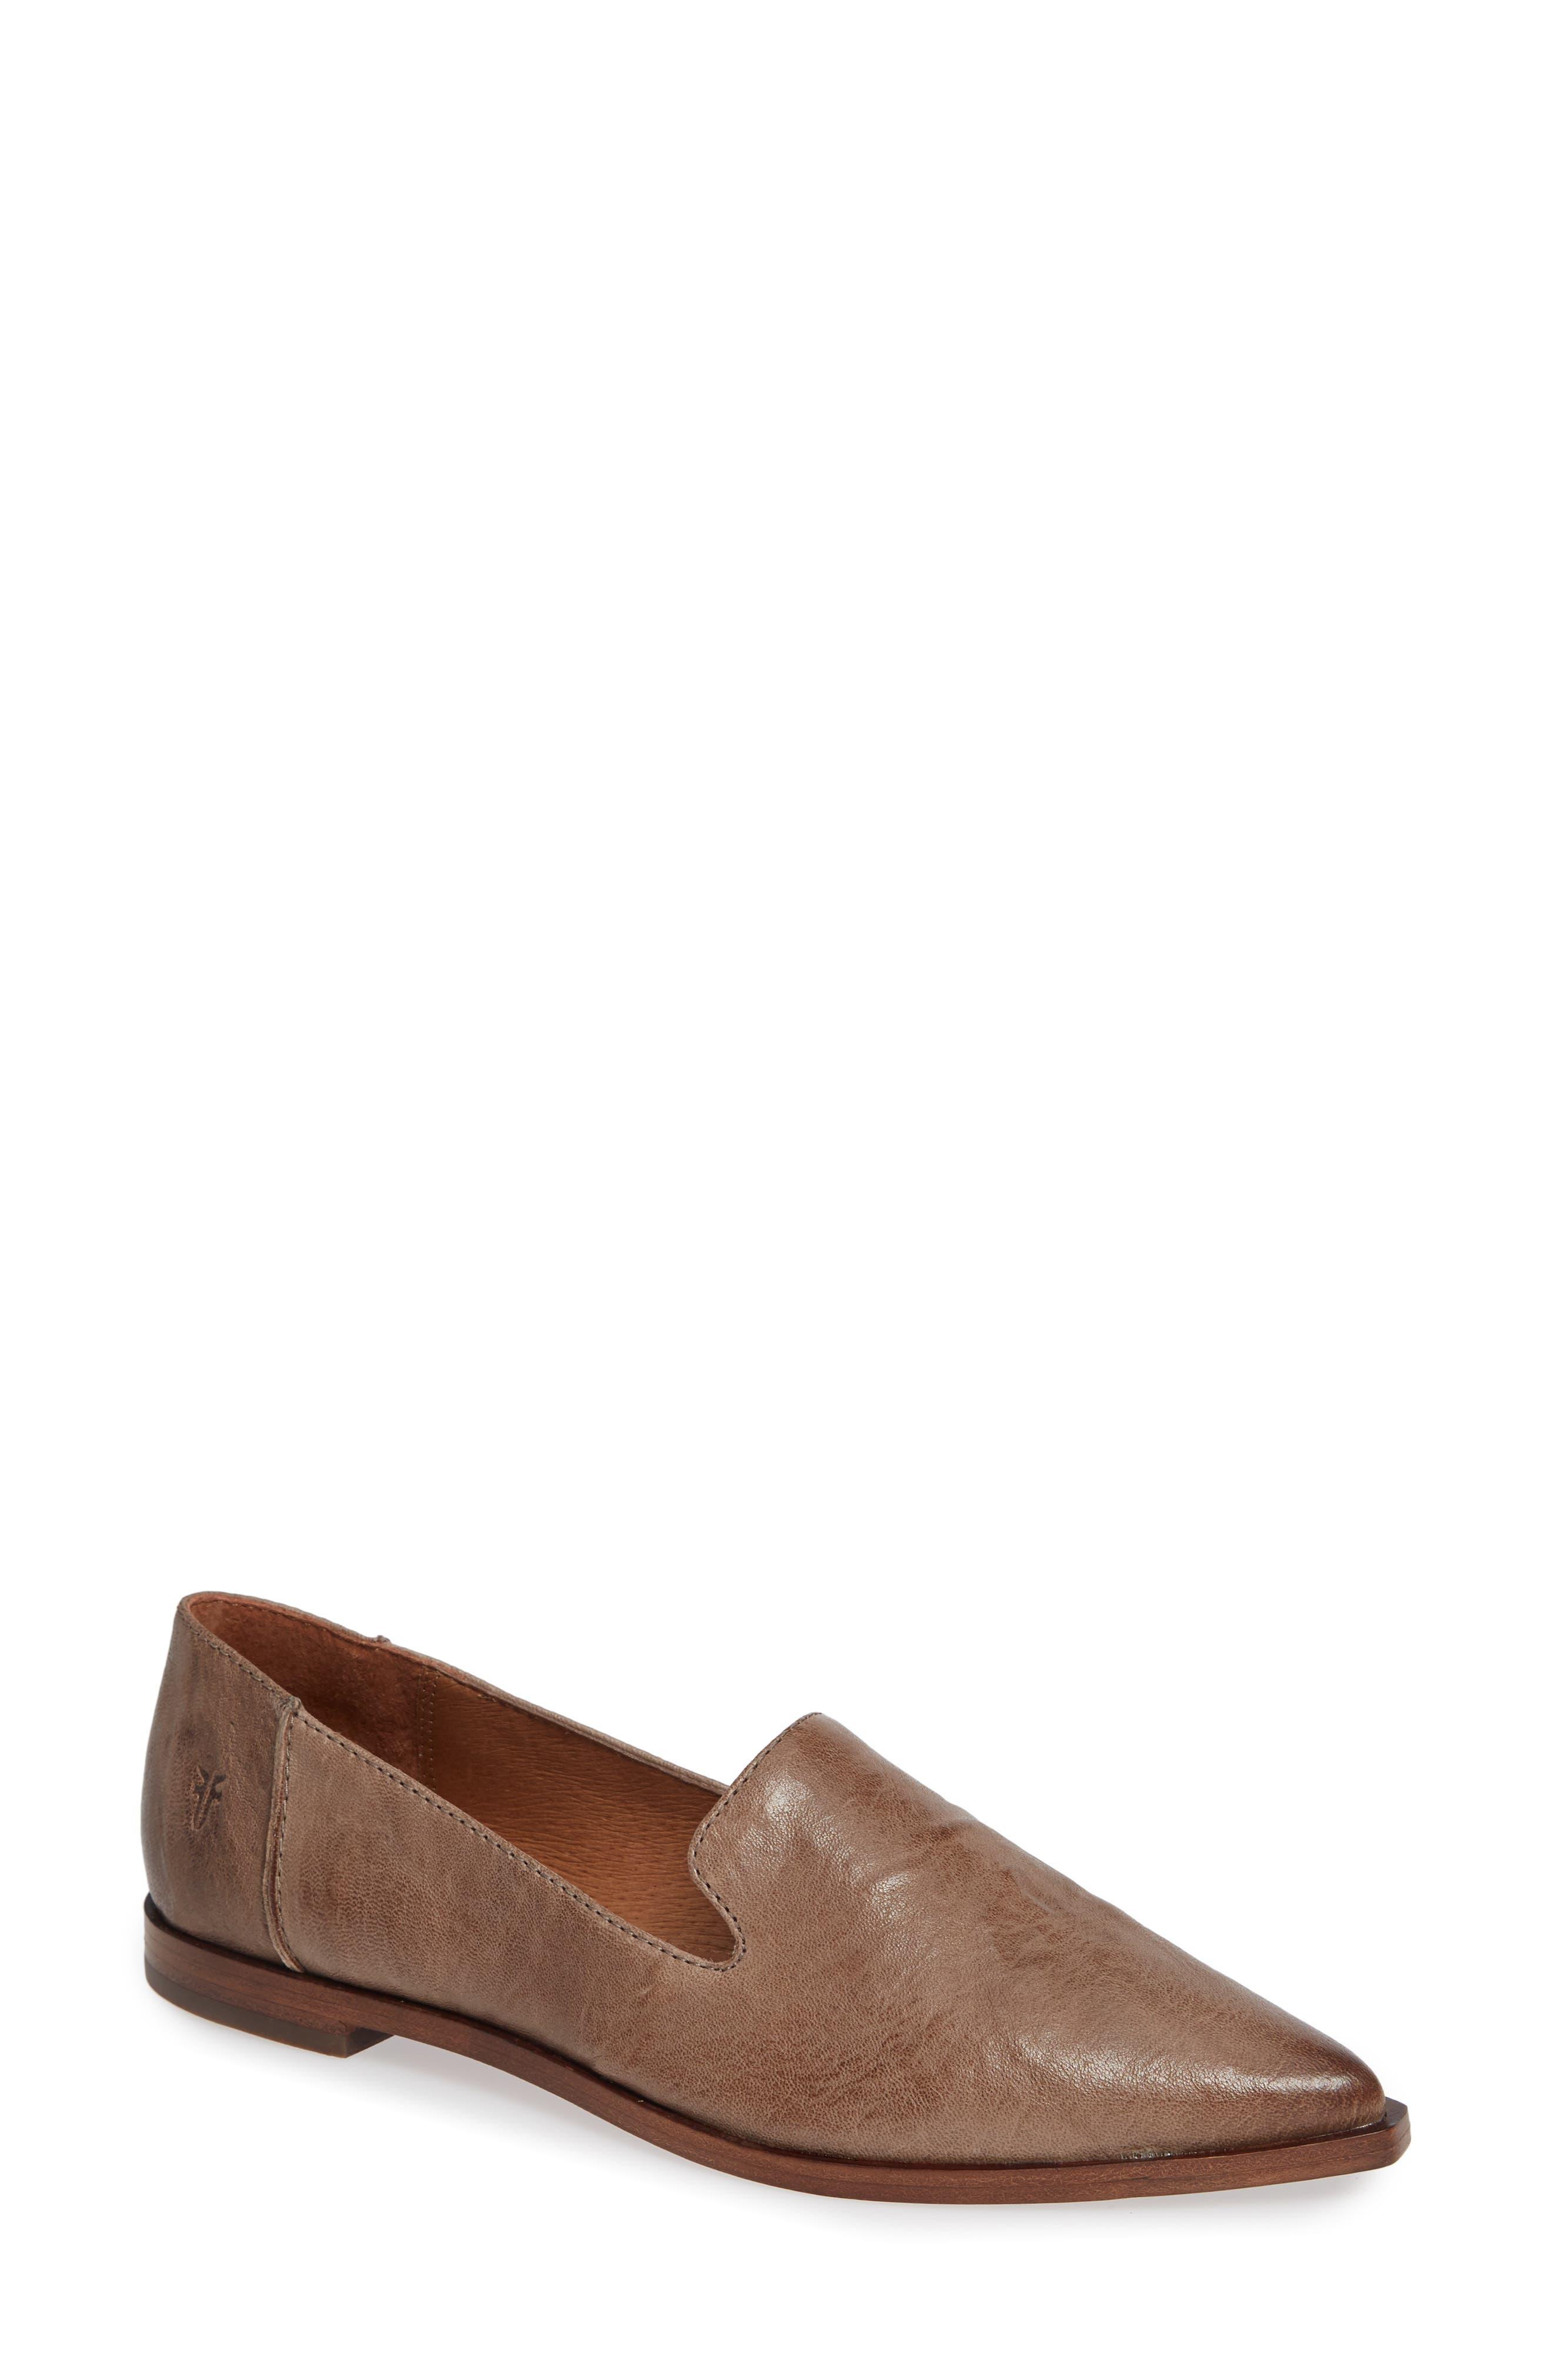 Kenzie Venetian Flat, Grey Leather